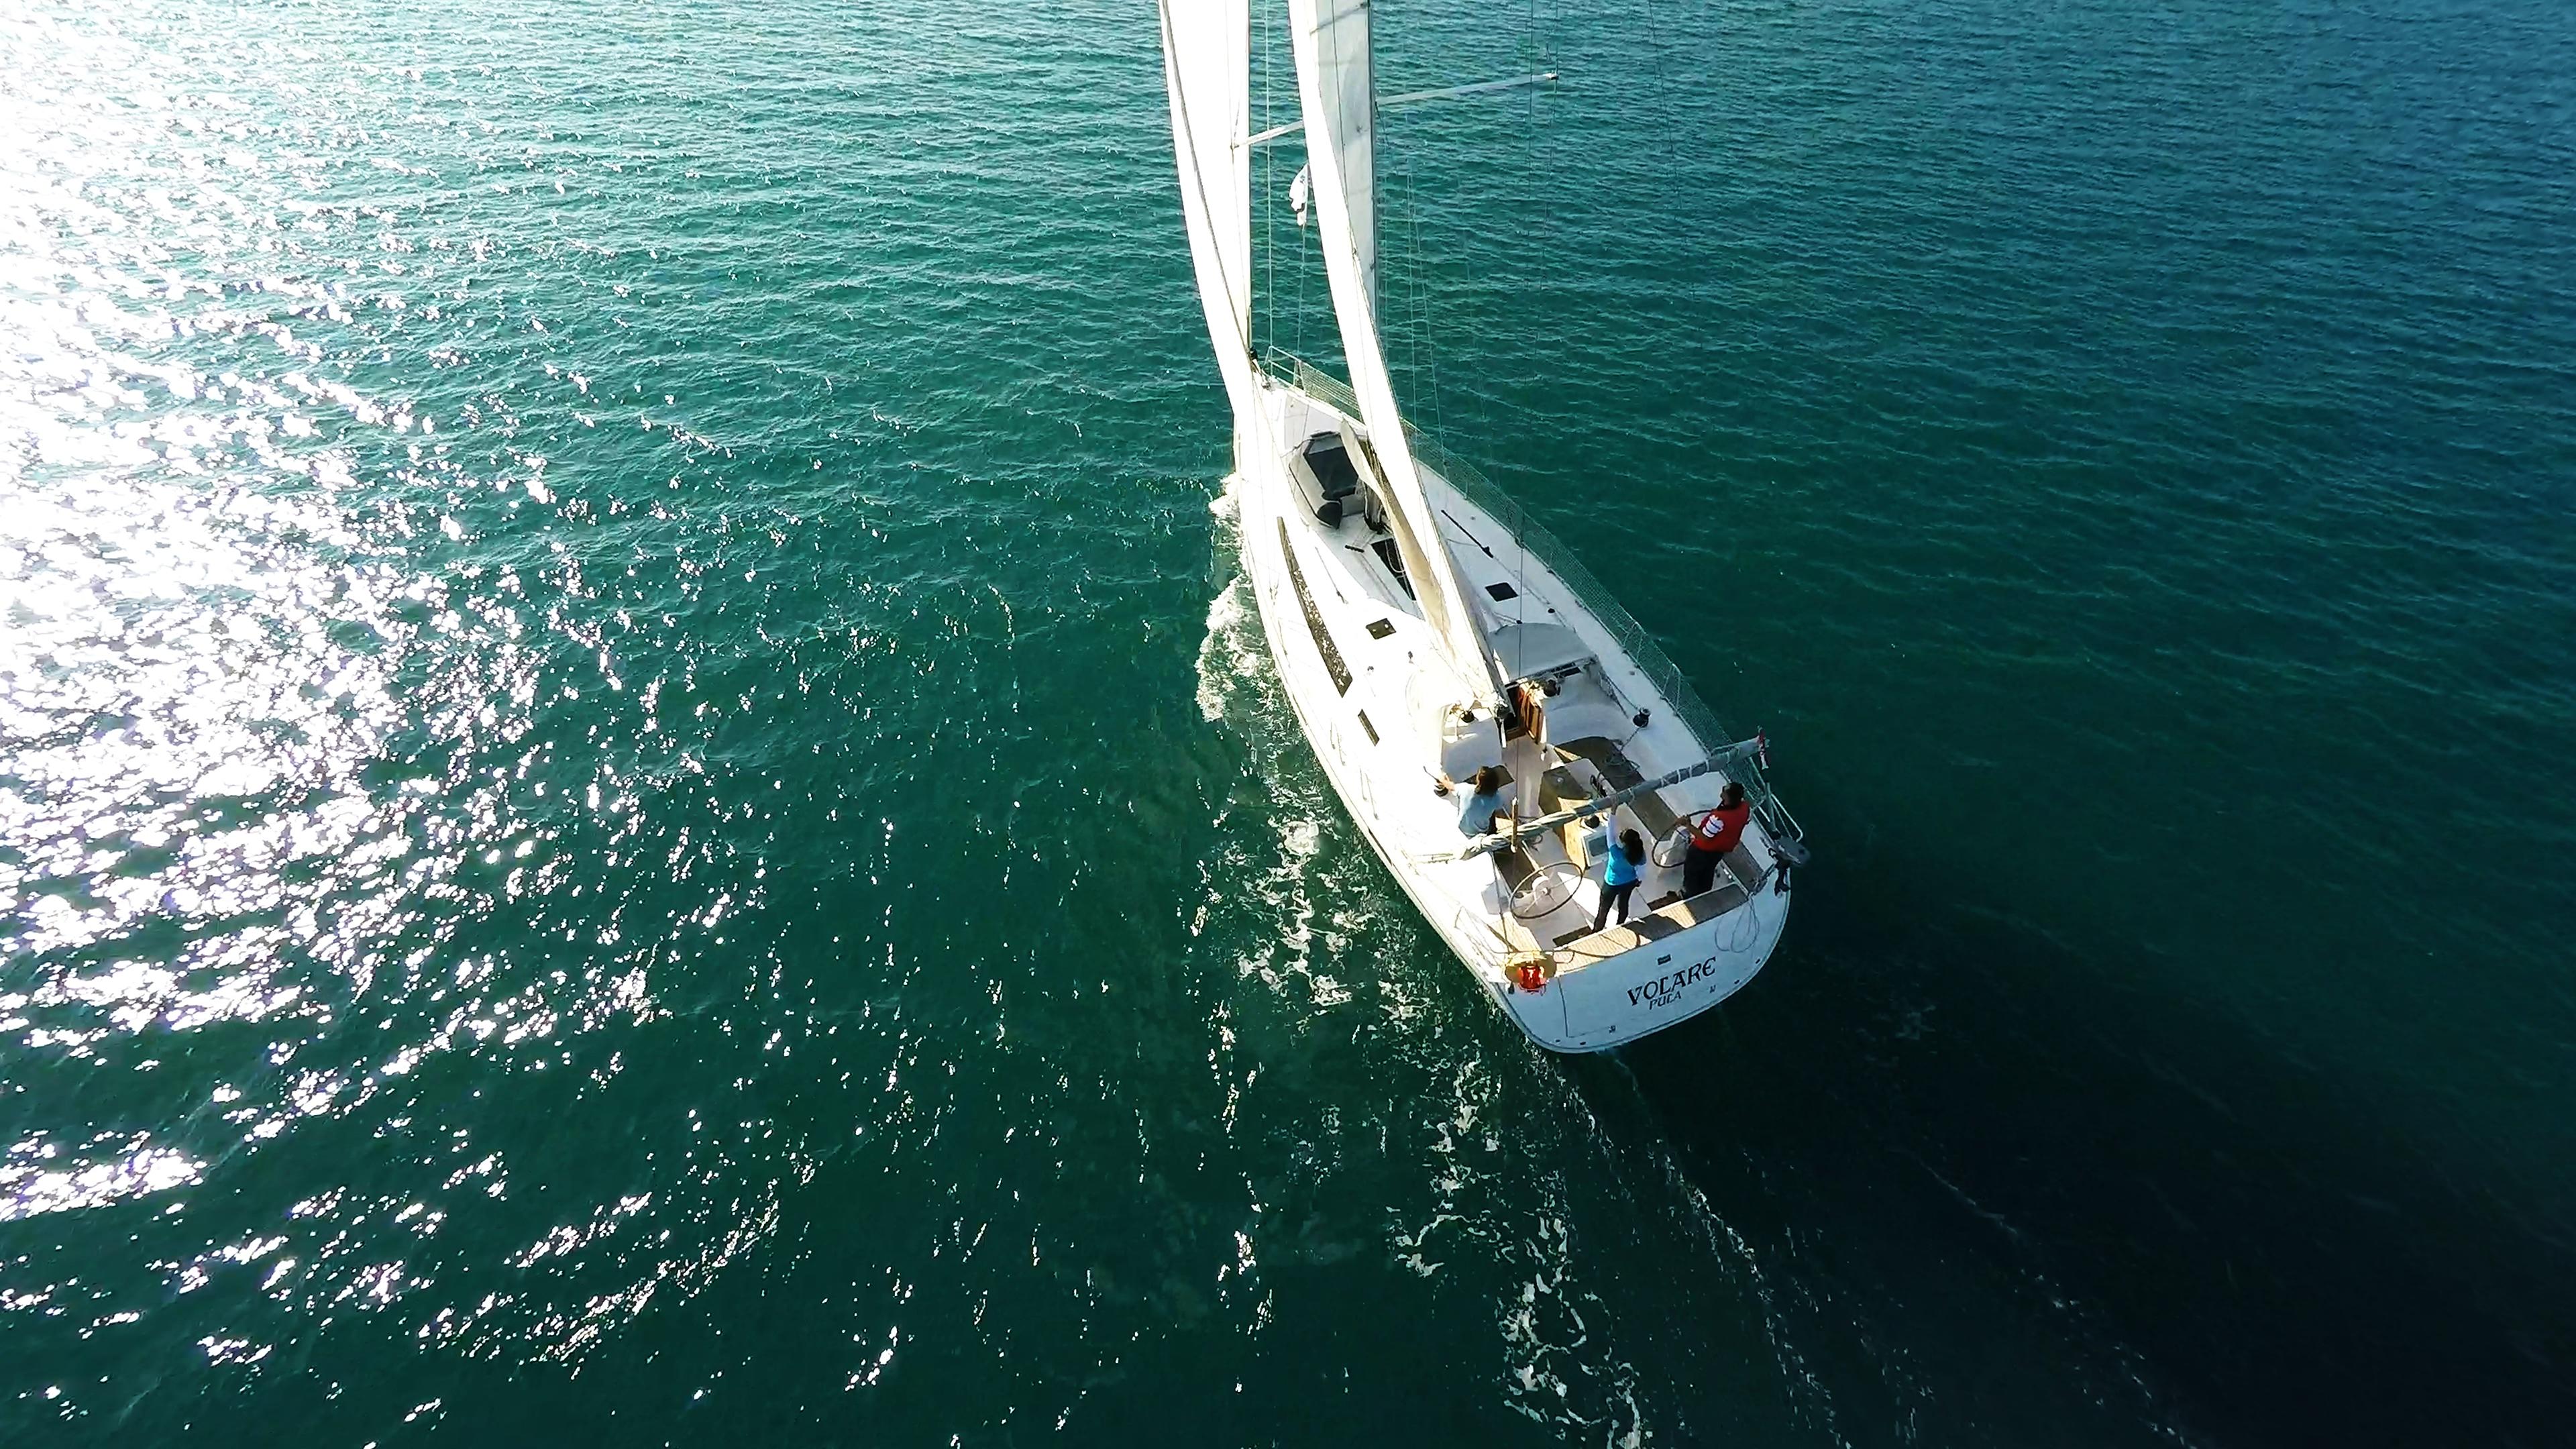 barcha a vela yacht a vela bavaria 46 riflesso del sole vela mare